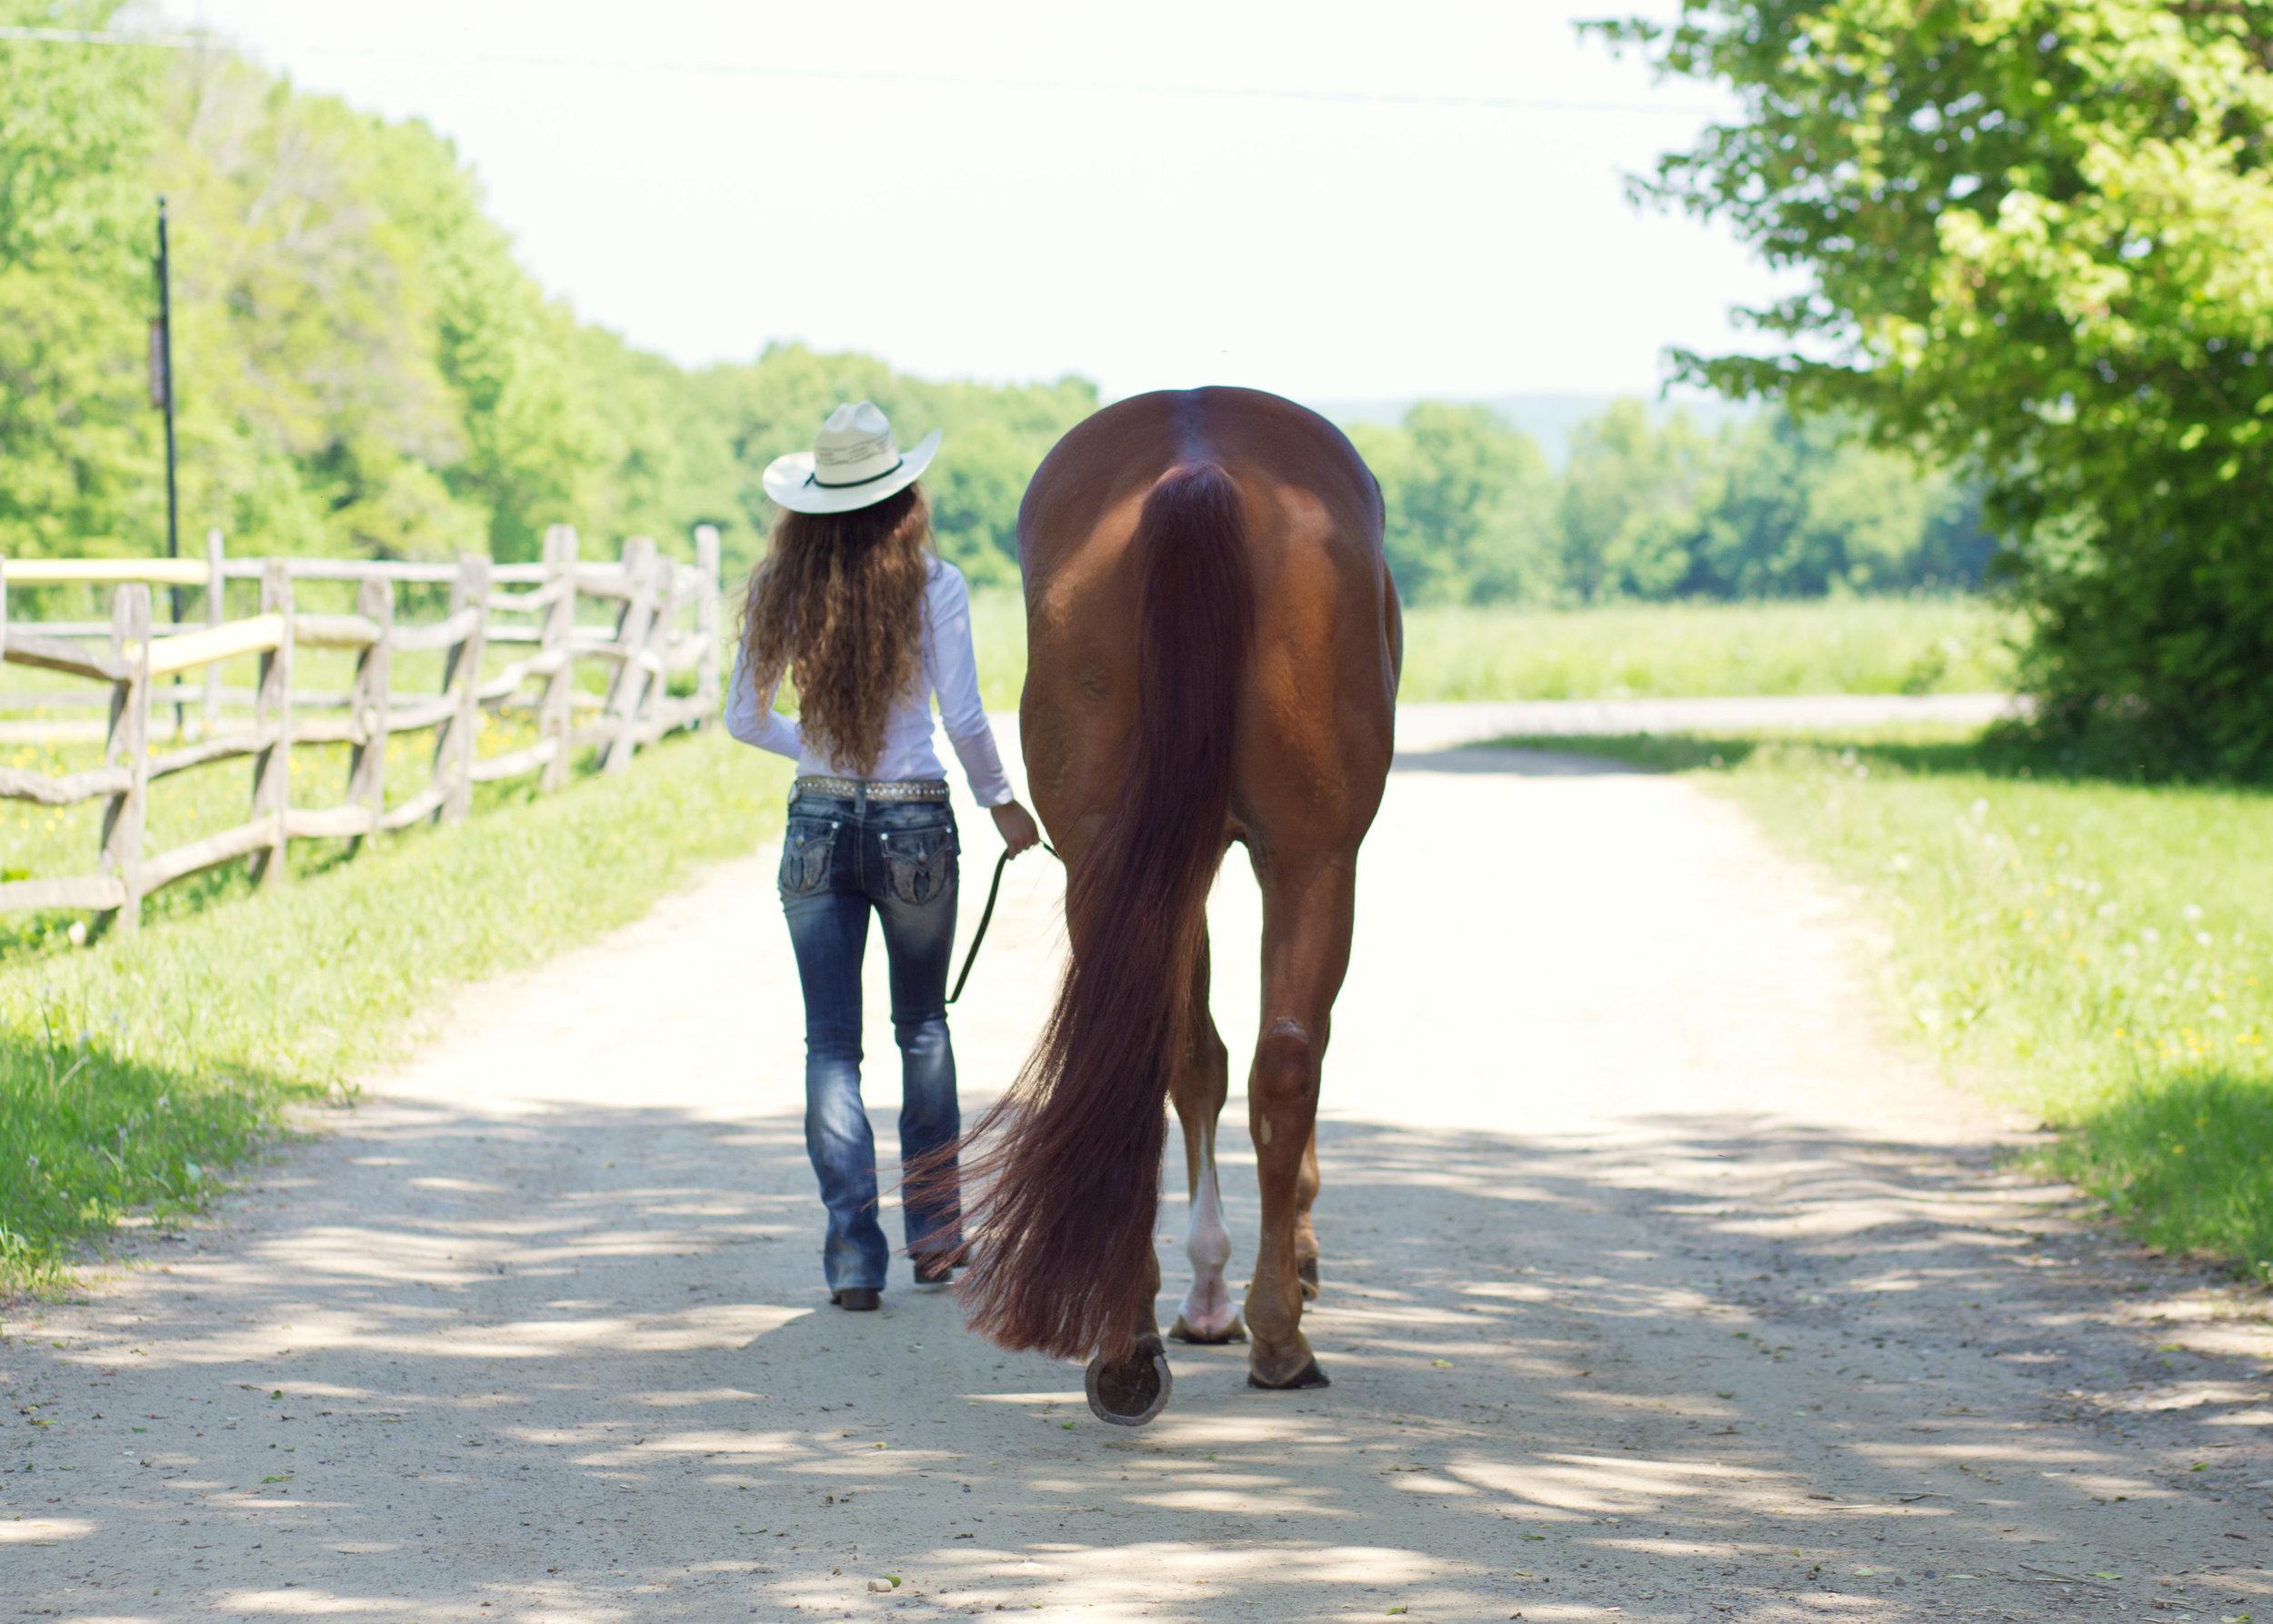 Senior Girl with Horse | Kelly Rhoades Photography